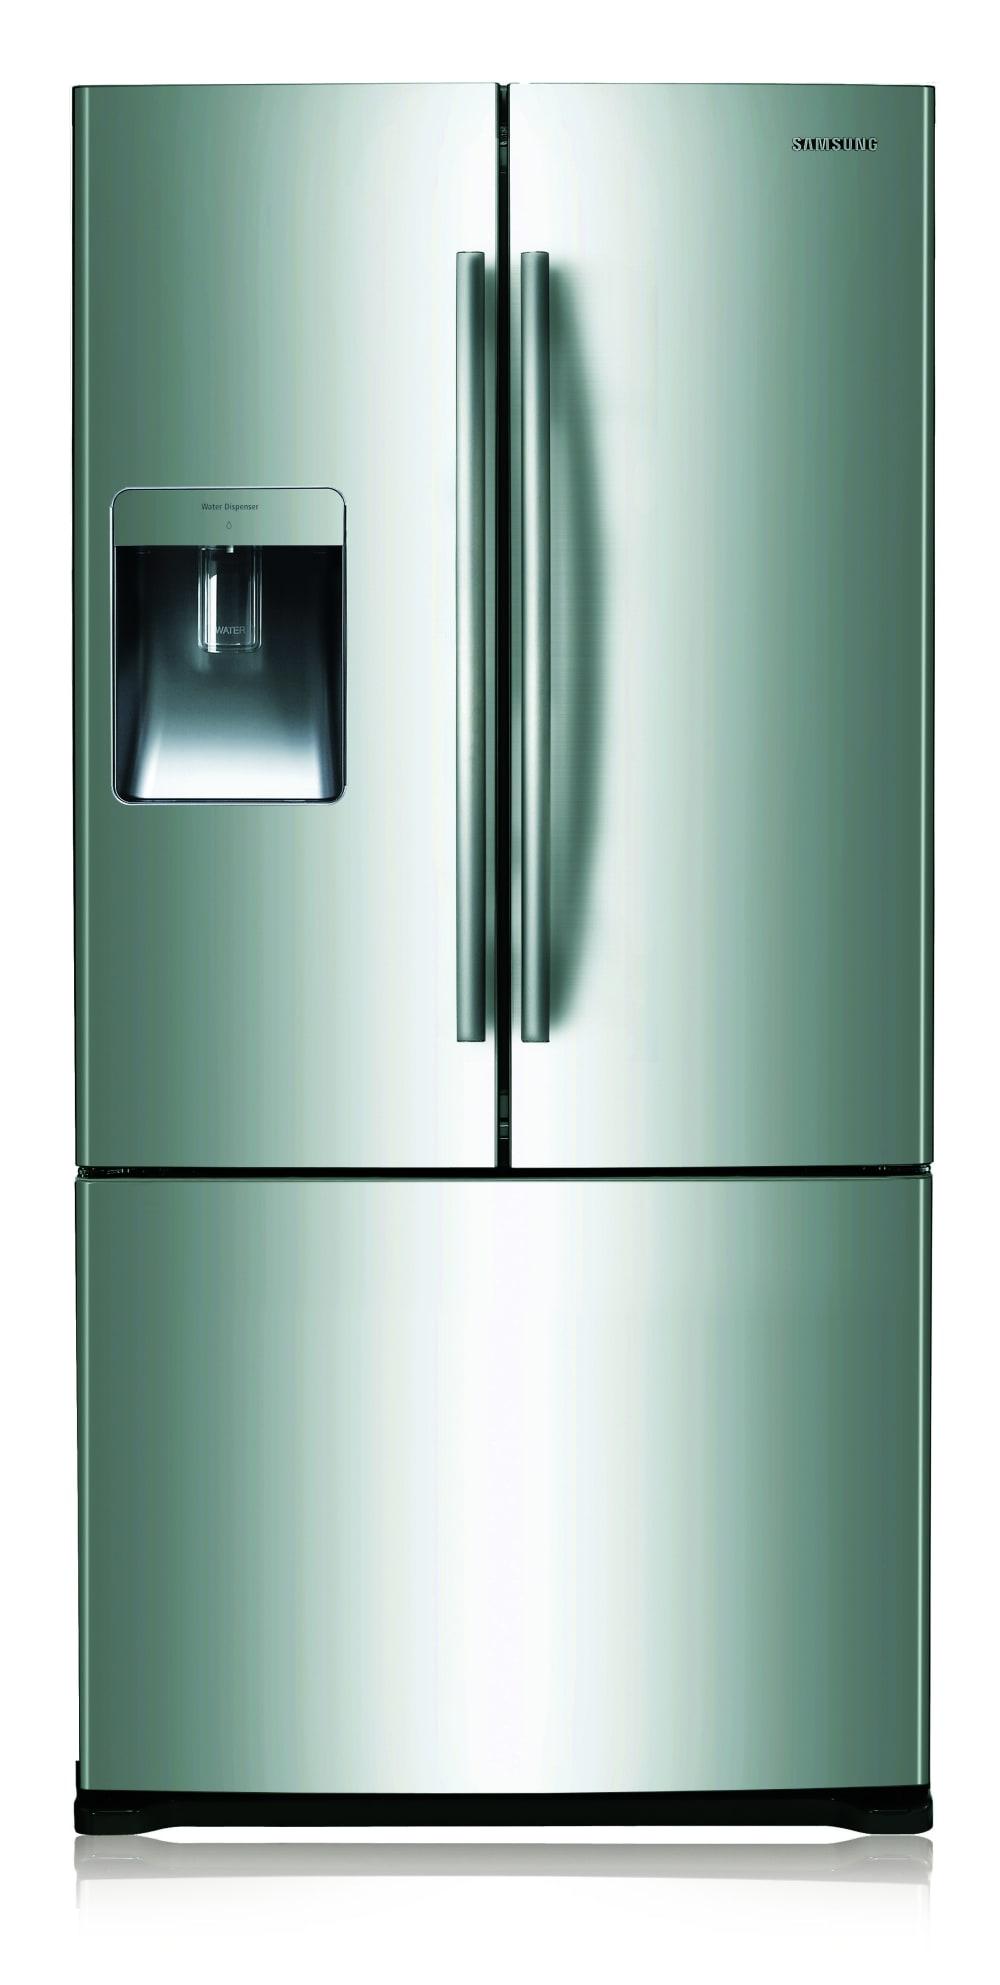 reviews for samsung 533l french door refrigerator magness benrow. Black Bedroom Furniture Sets. Home Design Ideas